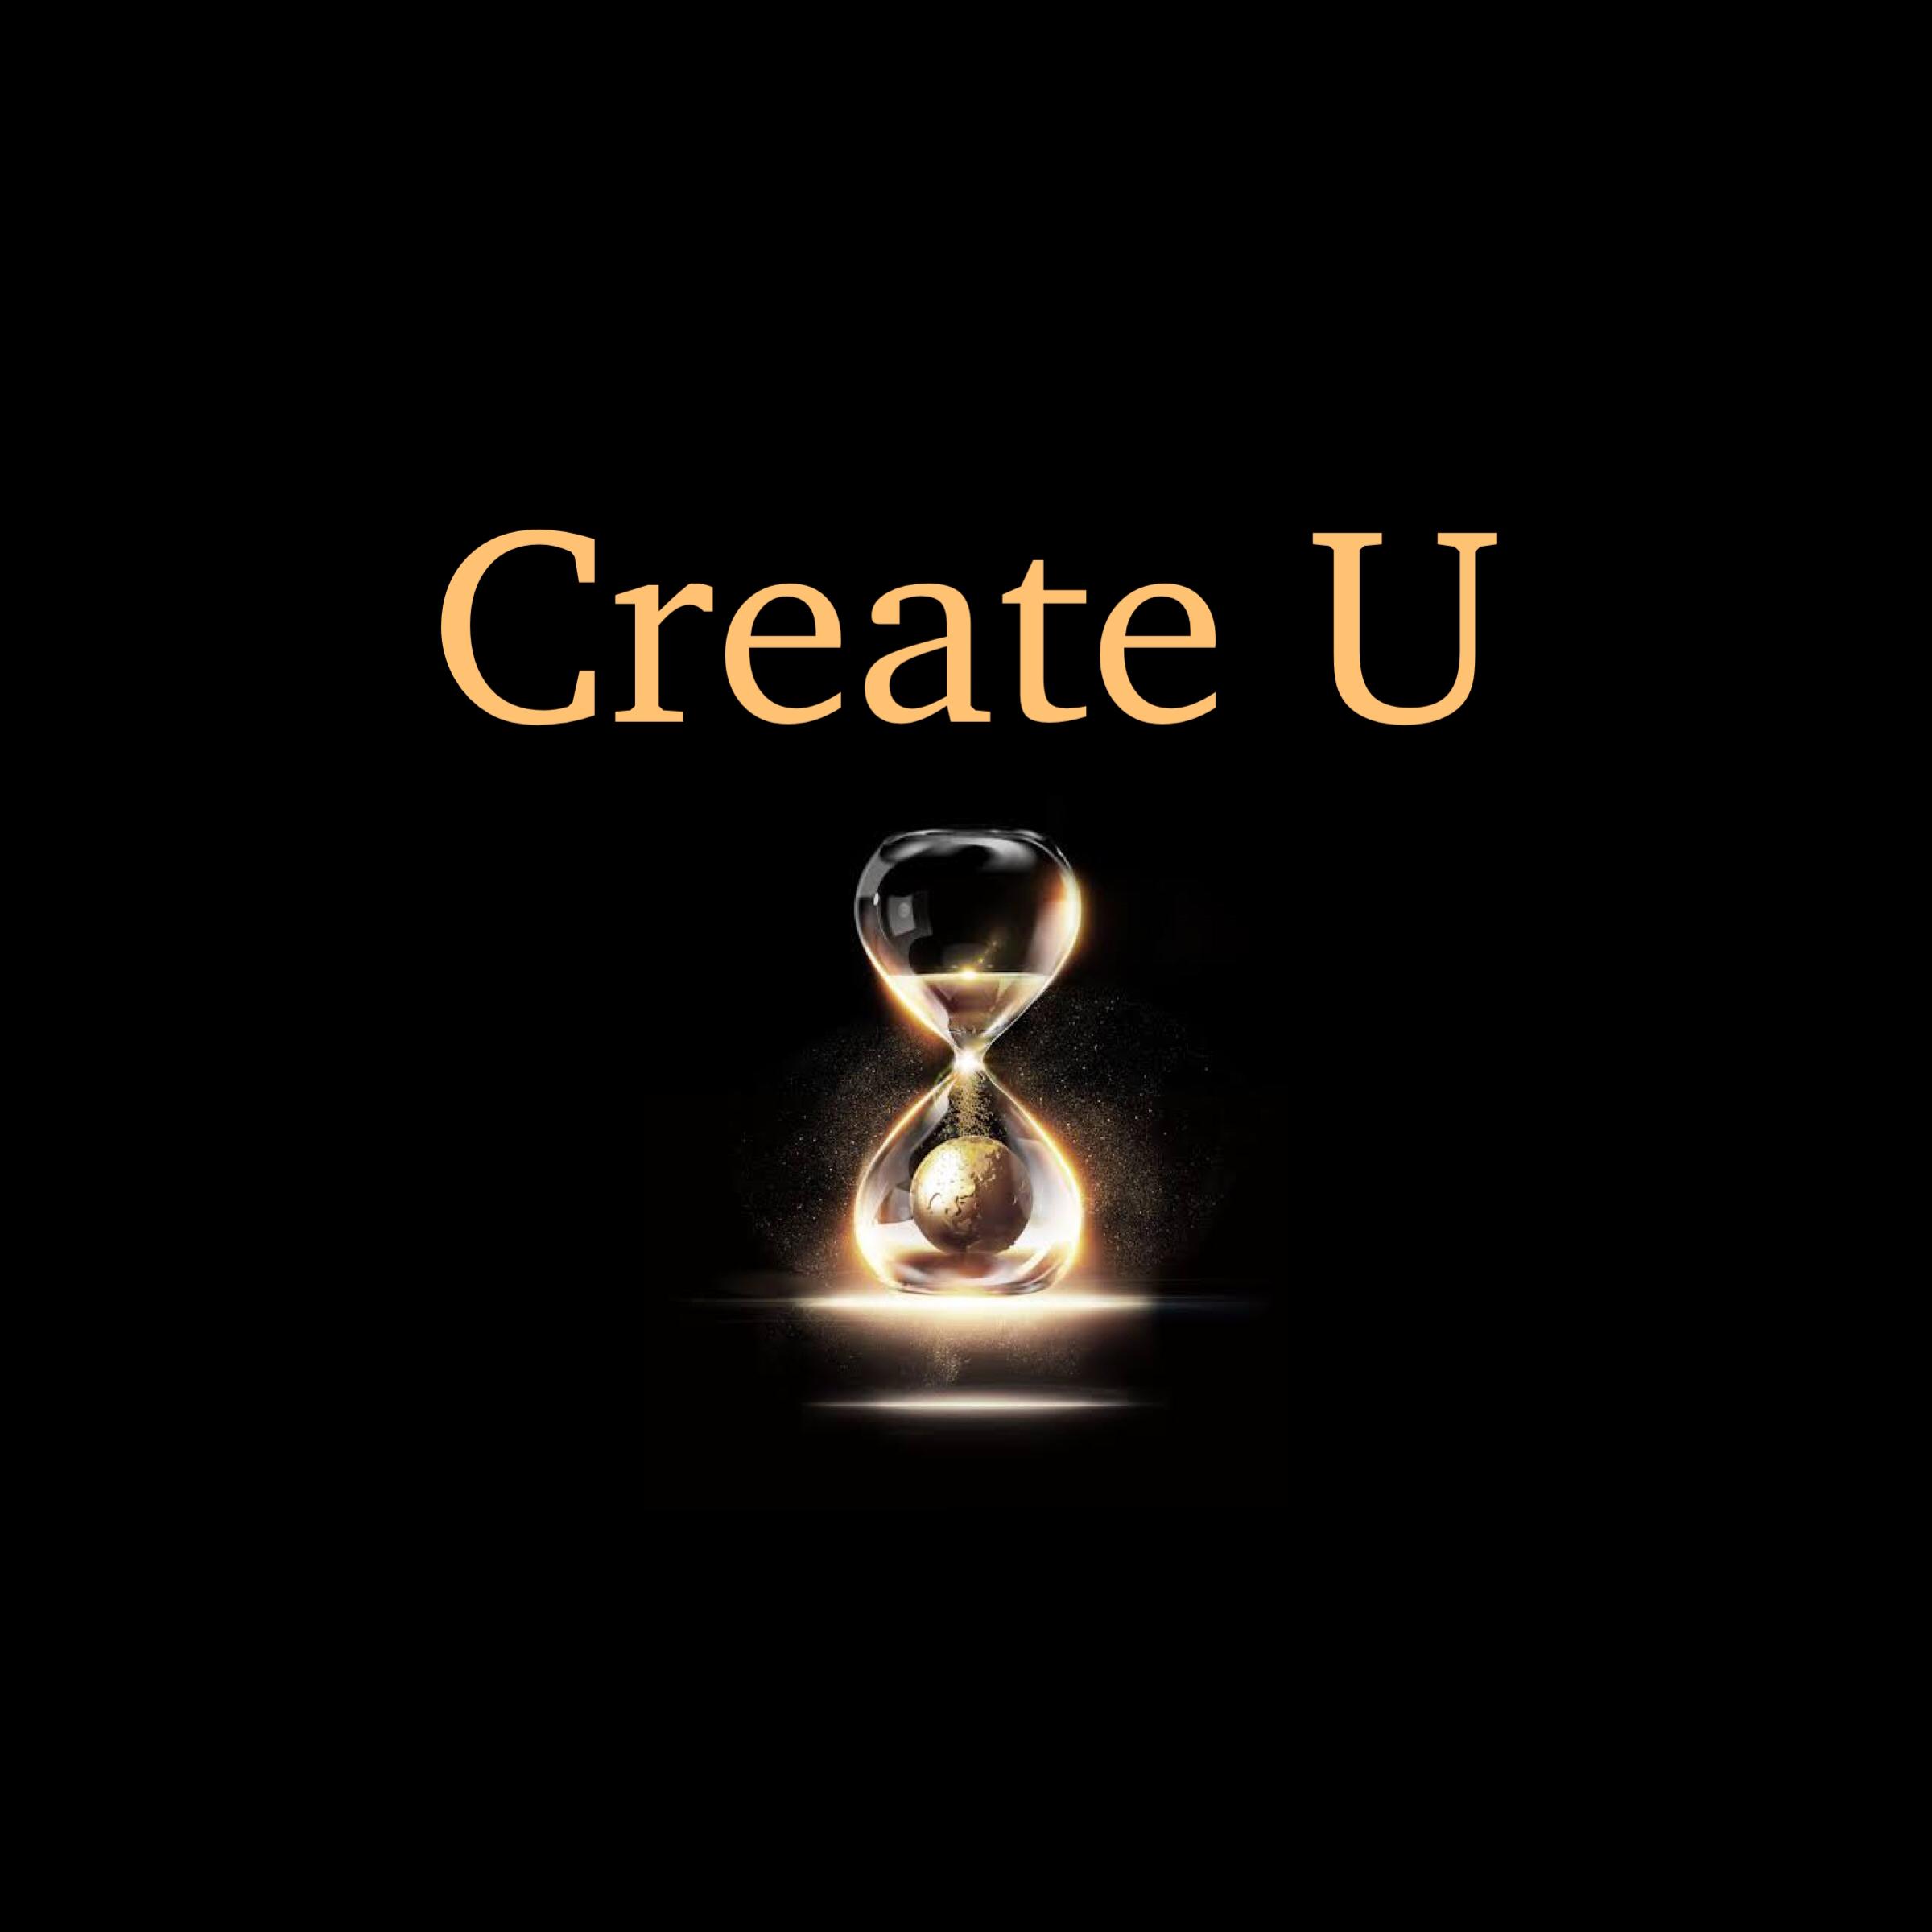 Create U logo